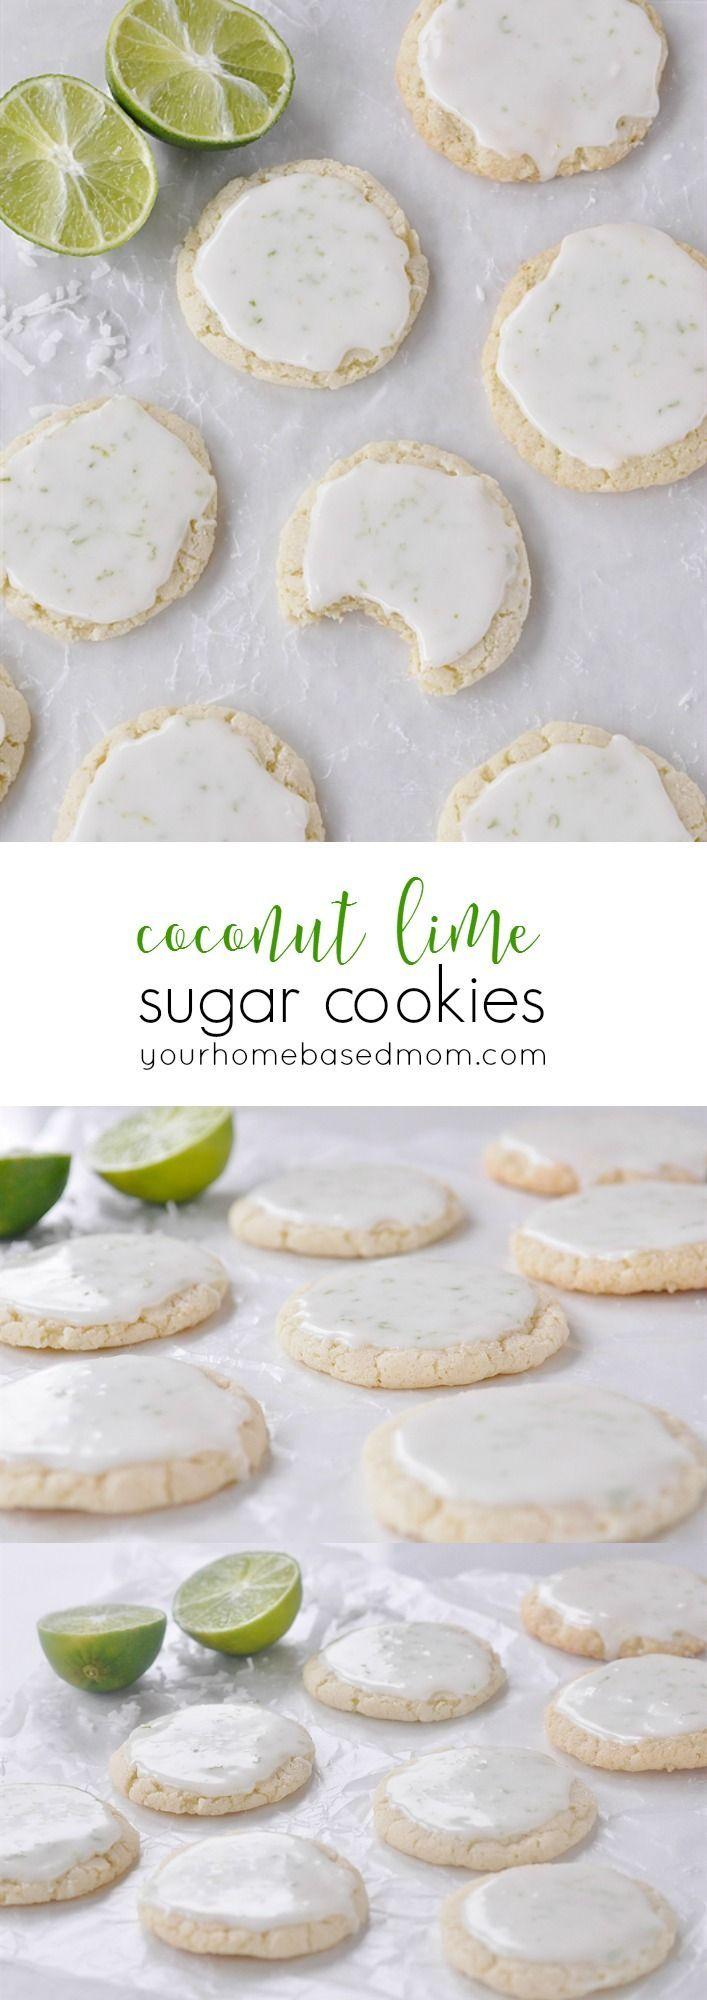 Coconut Lime Sugar Cookies Recipe